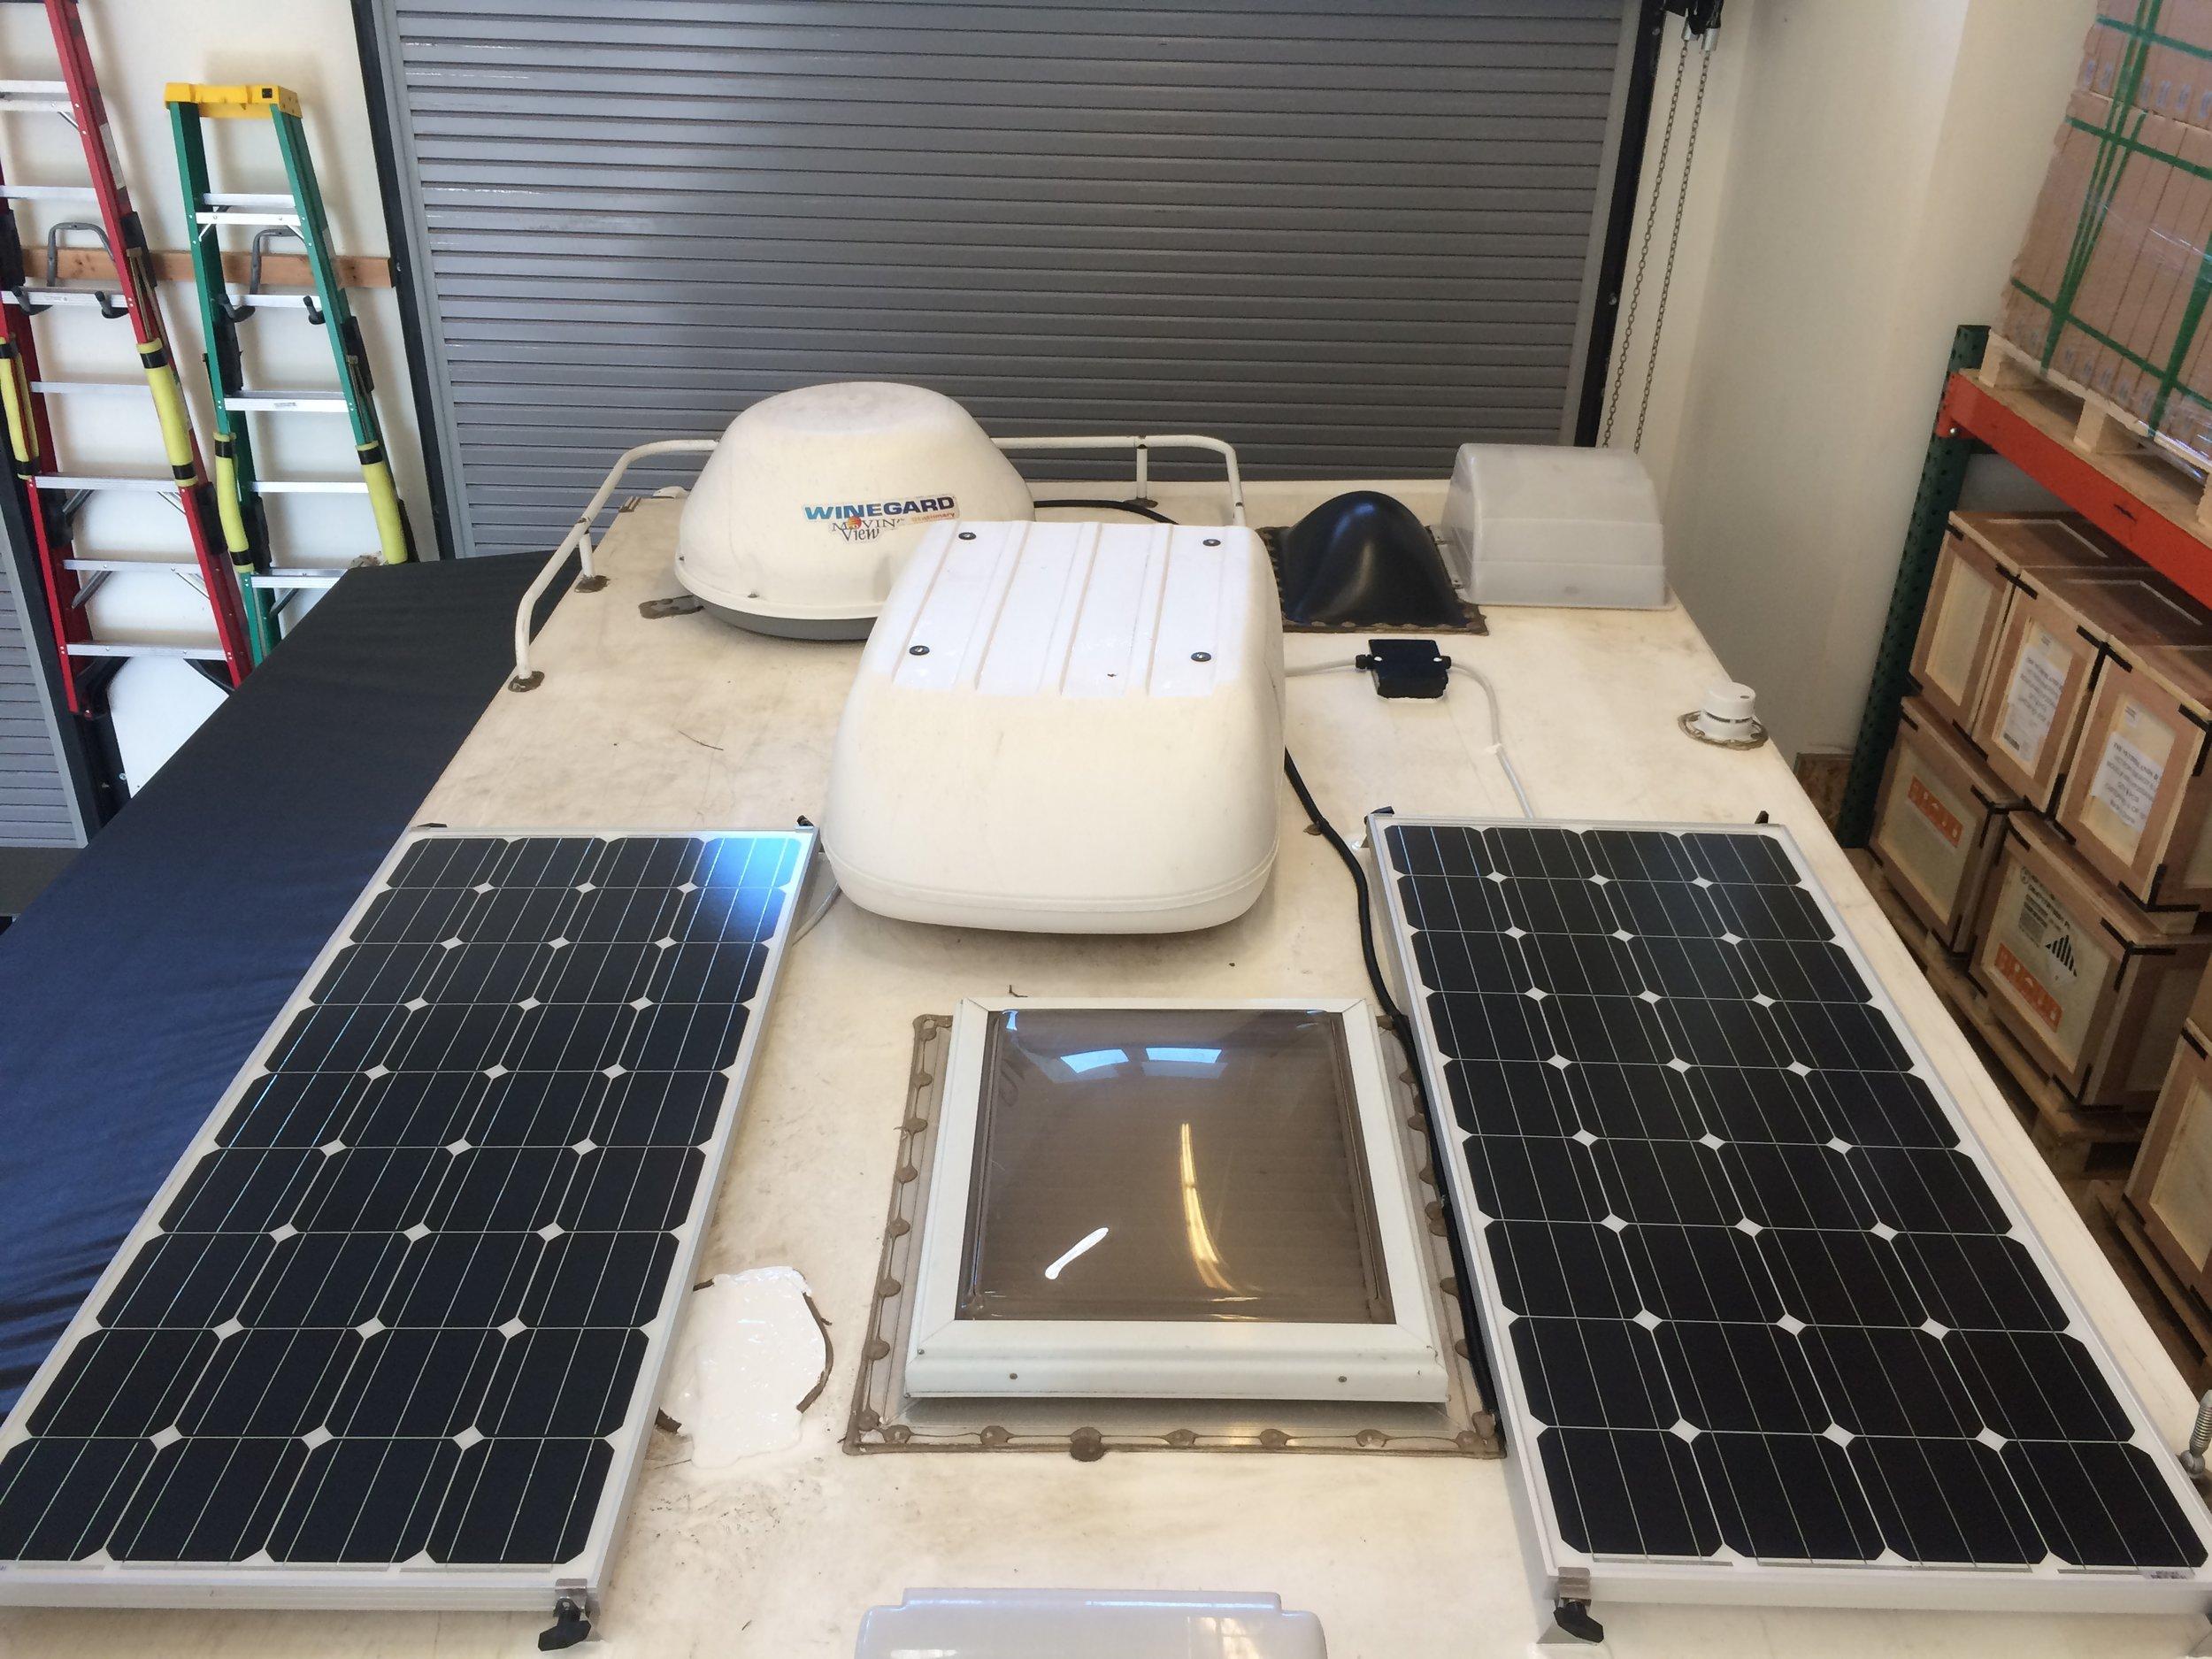 SF160 Solar Panels